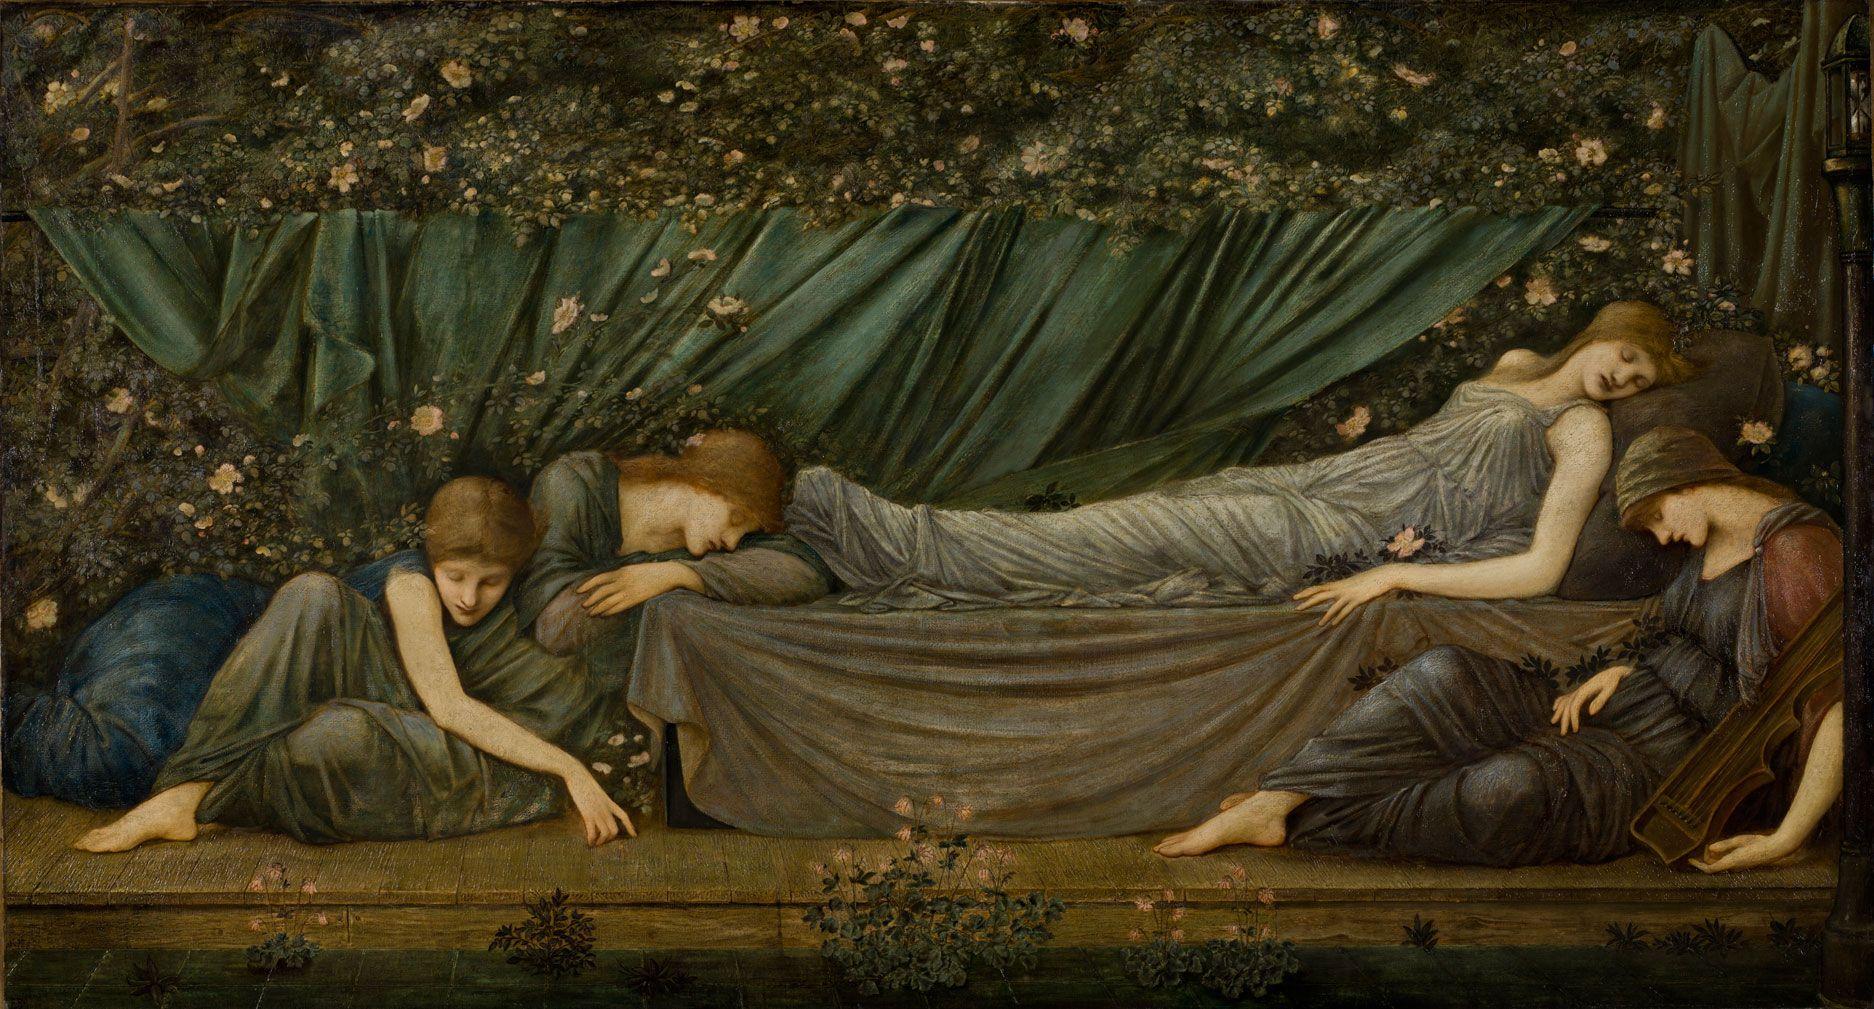 The Sleeping Beauty , Edward Burne-Jones